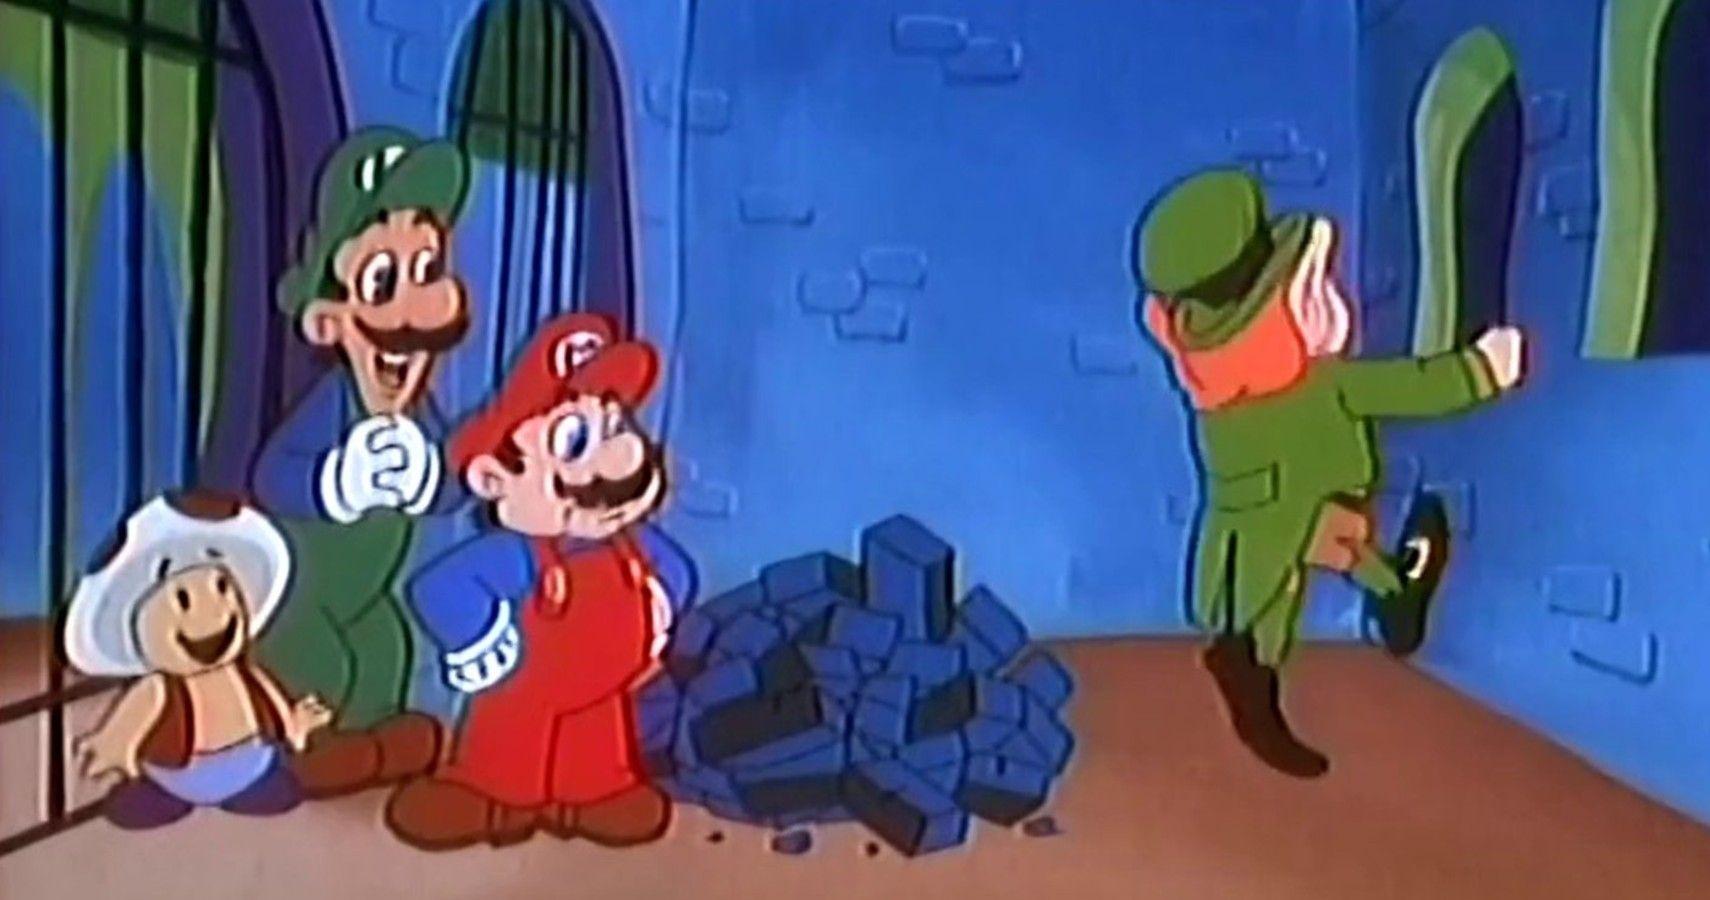 10 Best Episodes Of The Super Mario Bros Super Show According To